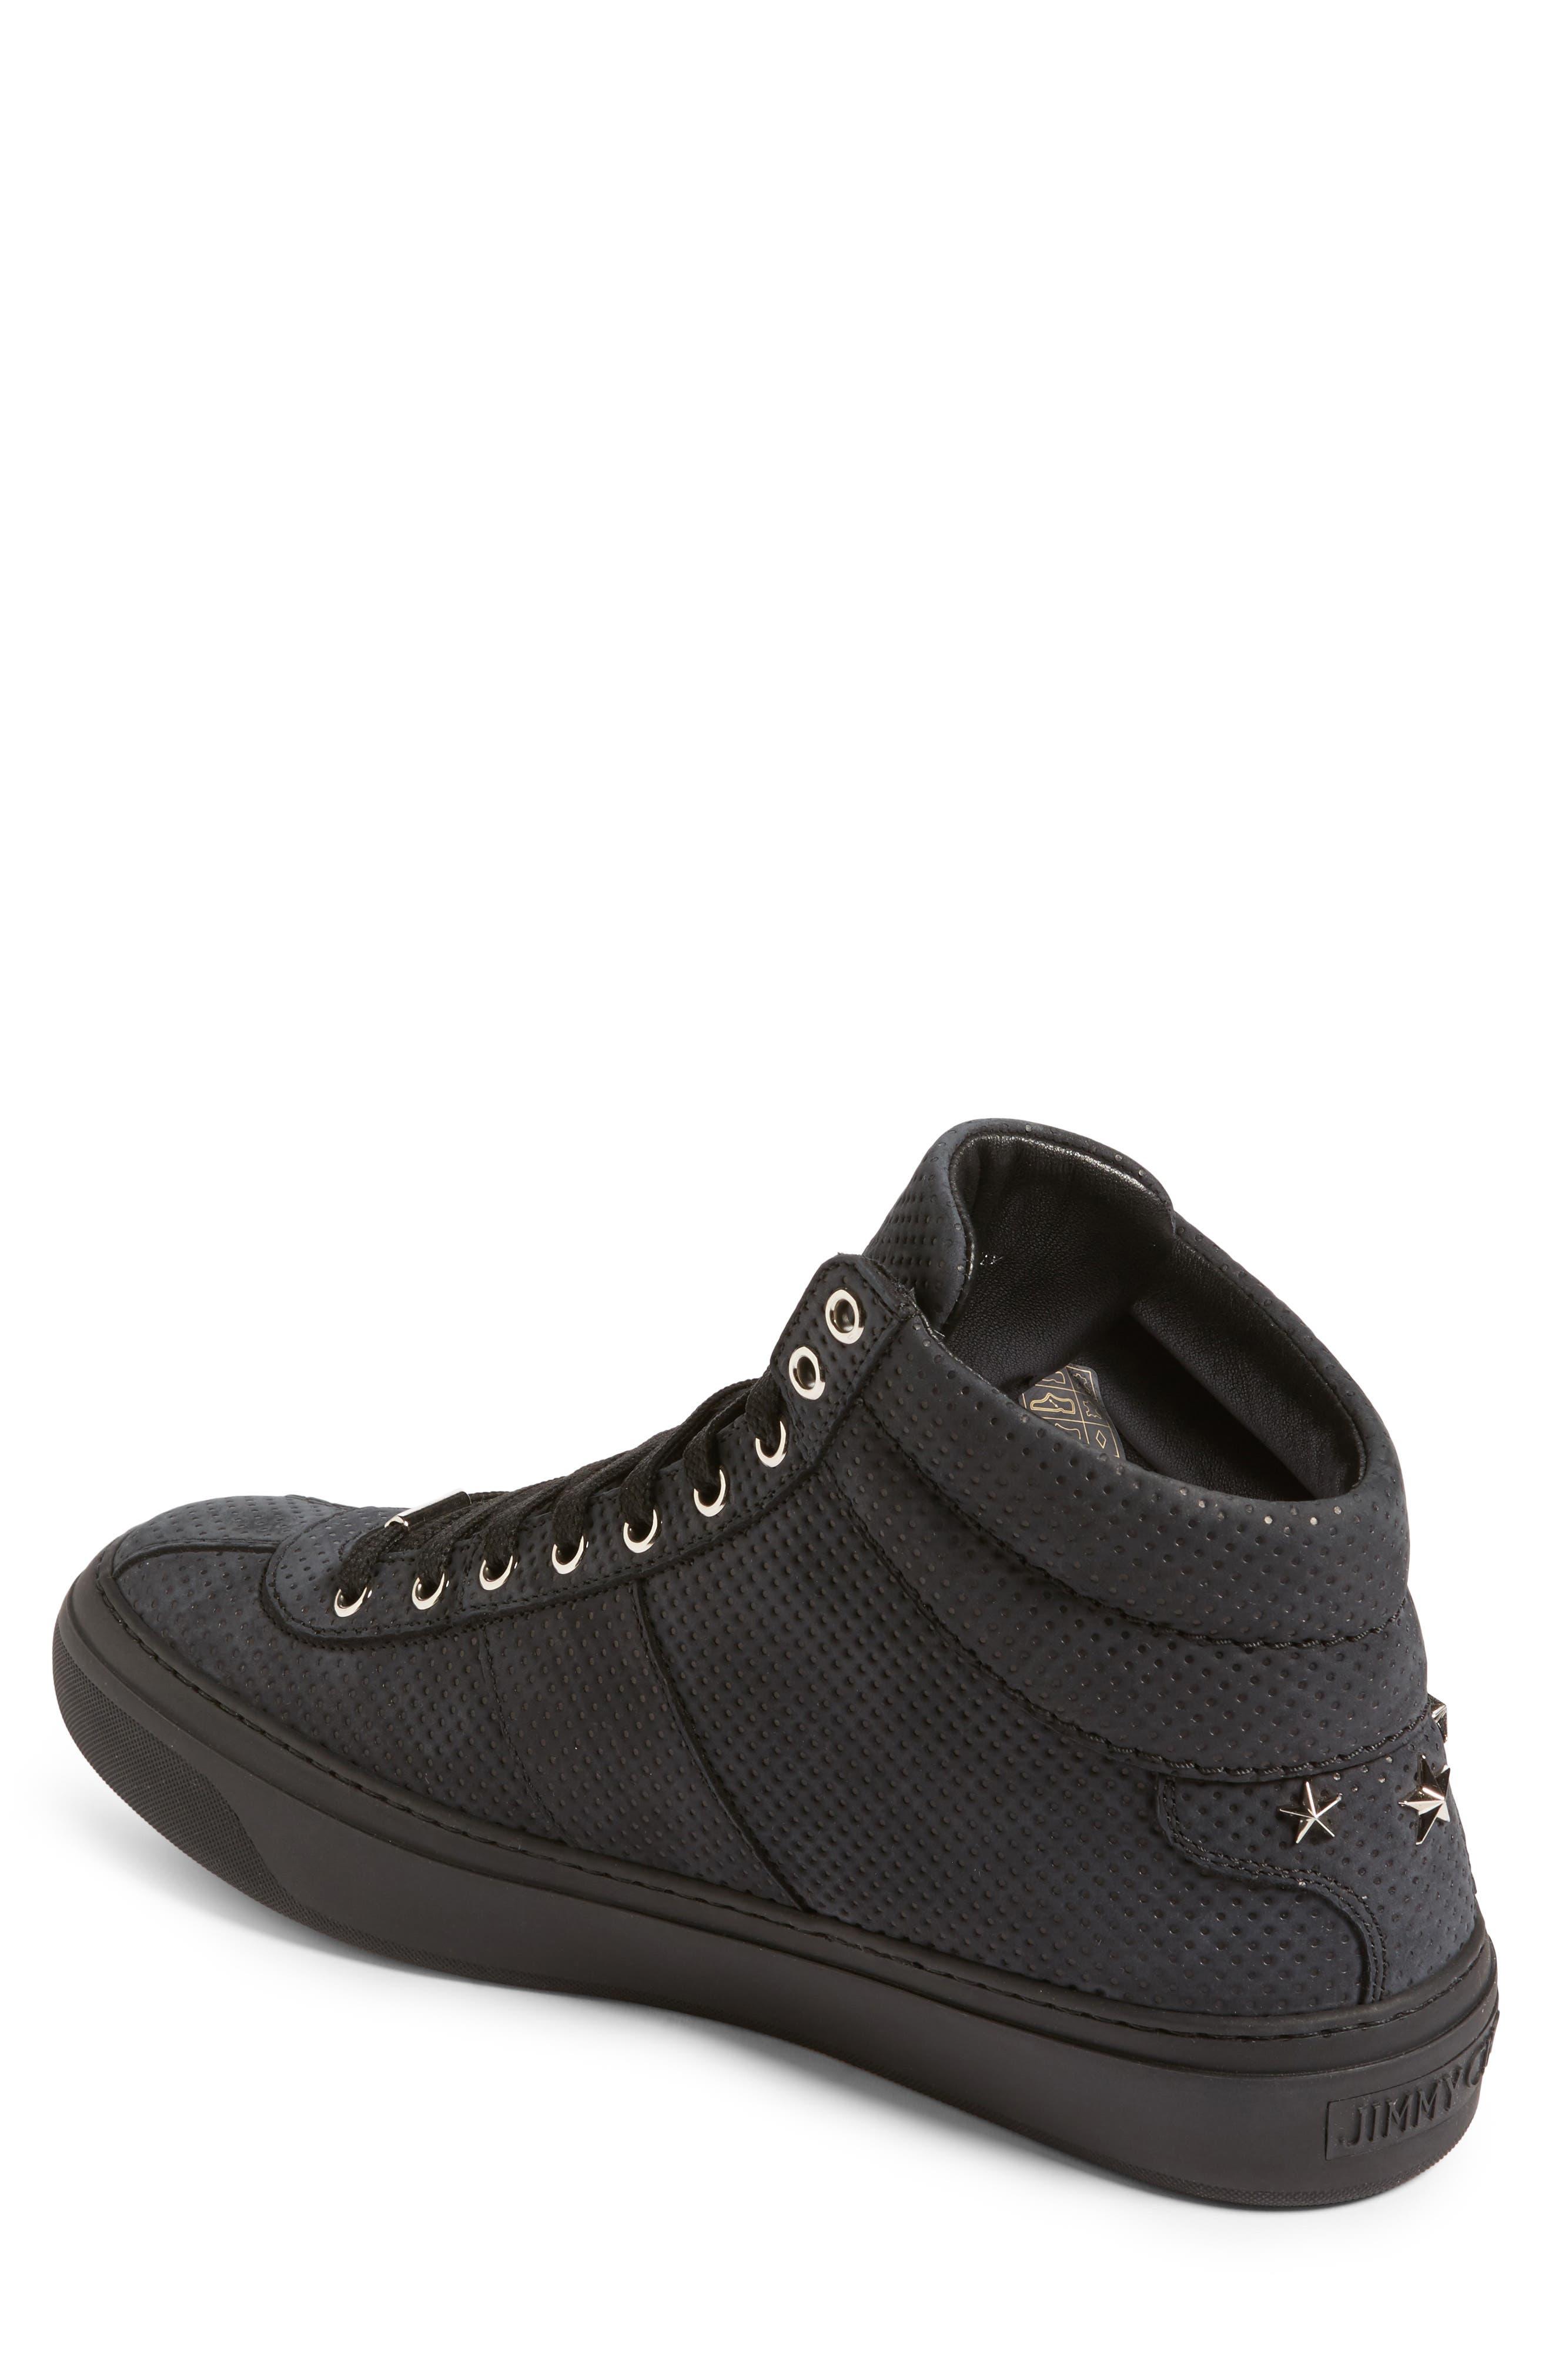 Belgravi Sneaker,                             Alternate thumbnail 2, color,                             001